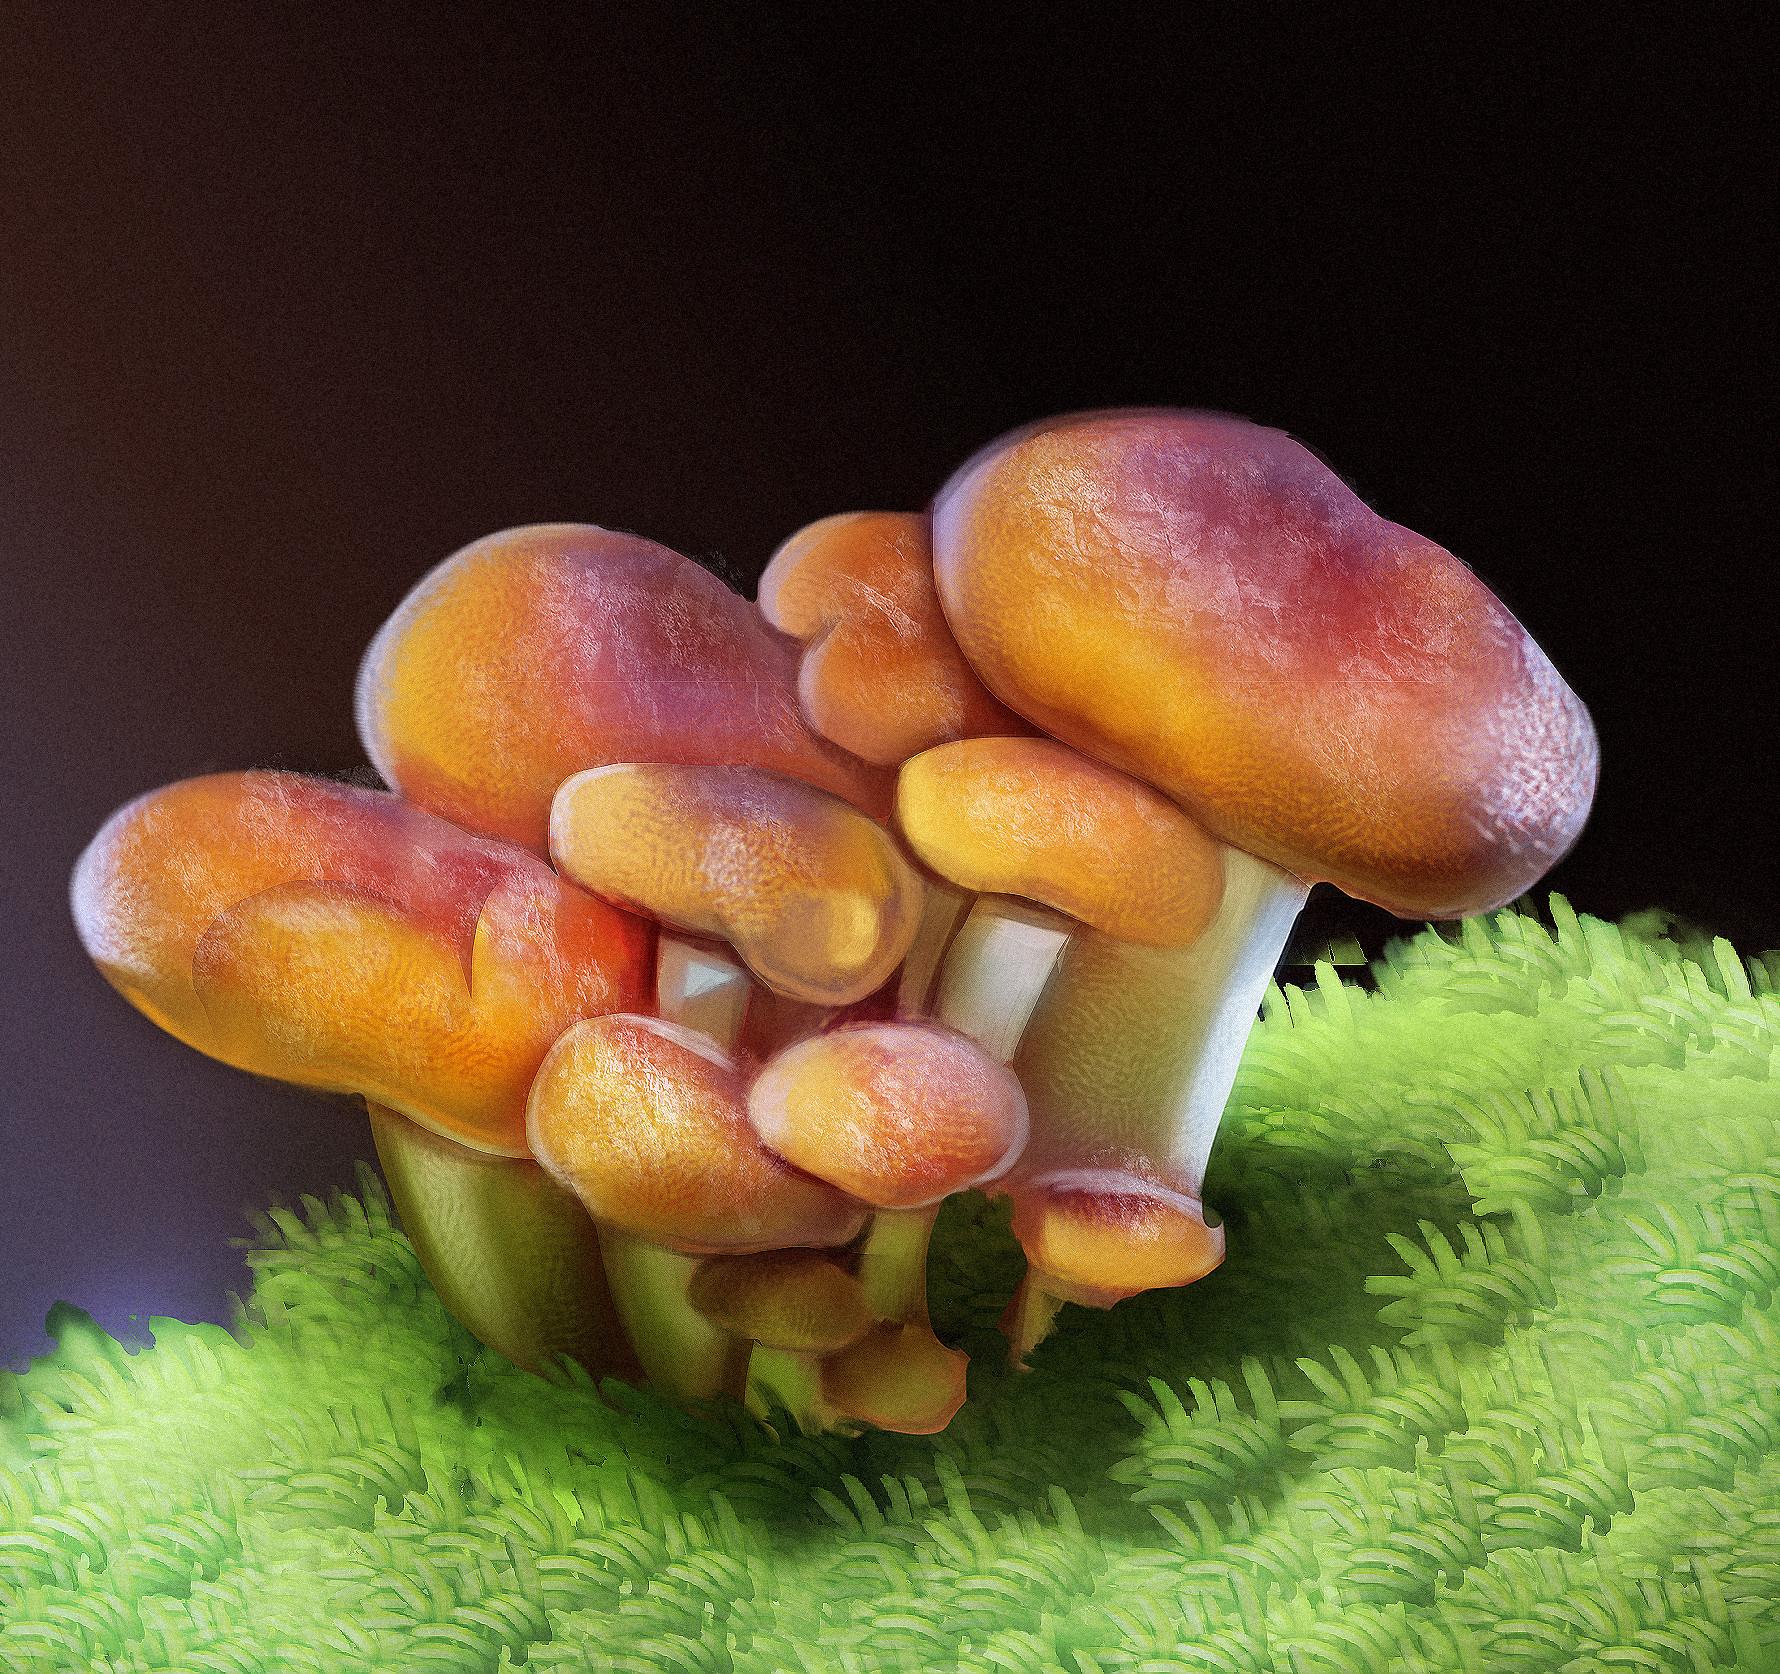 Guilherme freitas estudo cogumelo